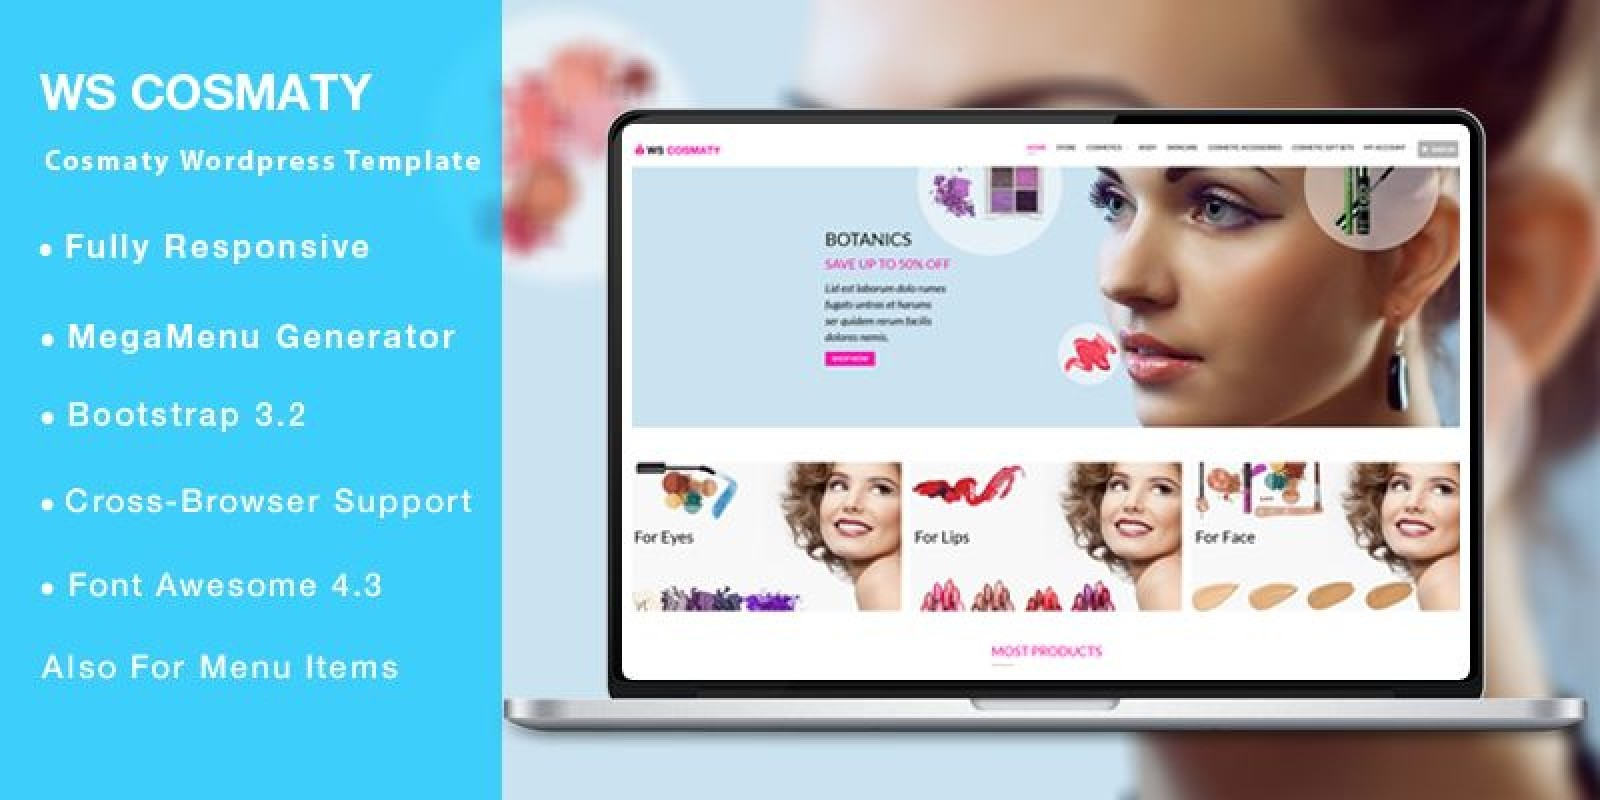 WS Cosmaty – Cosmetics Woocommerce Theme